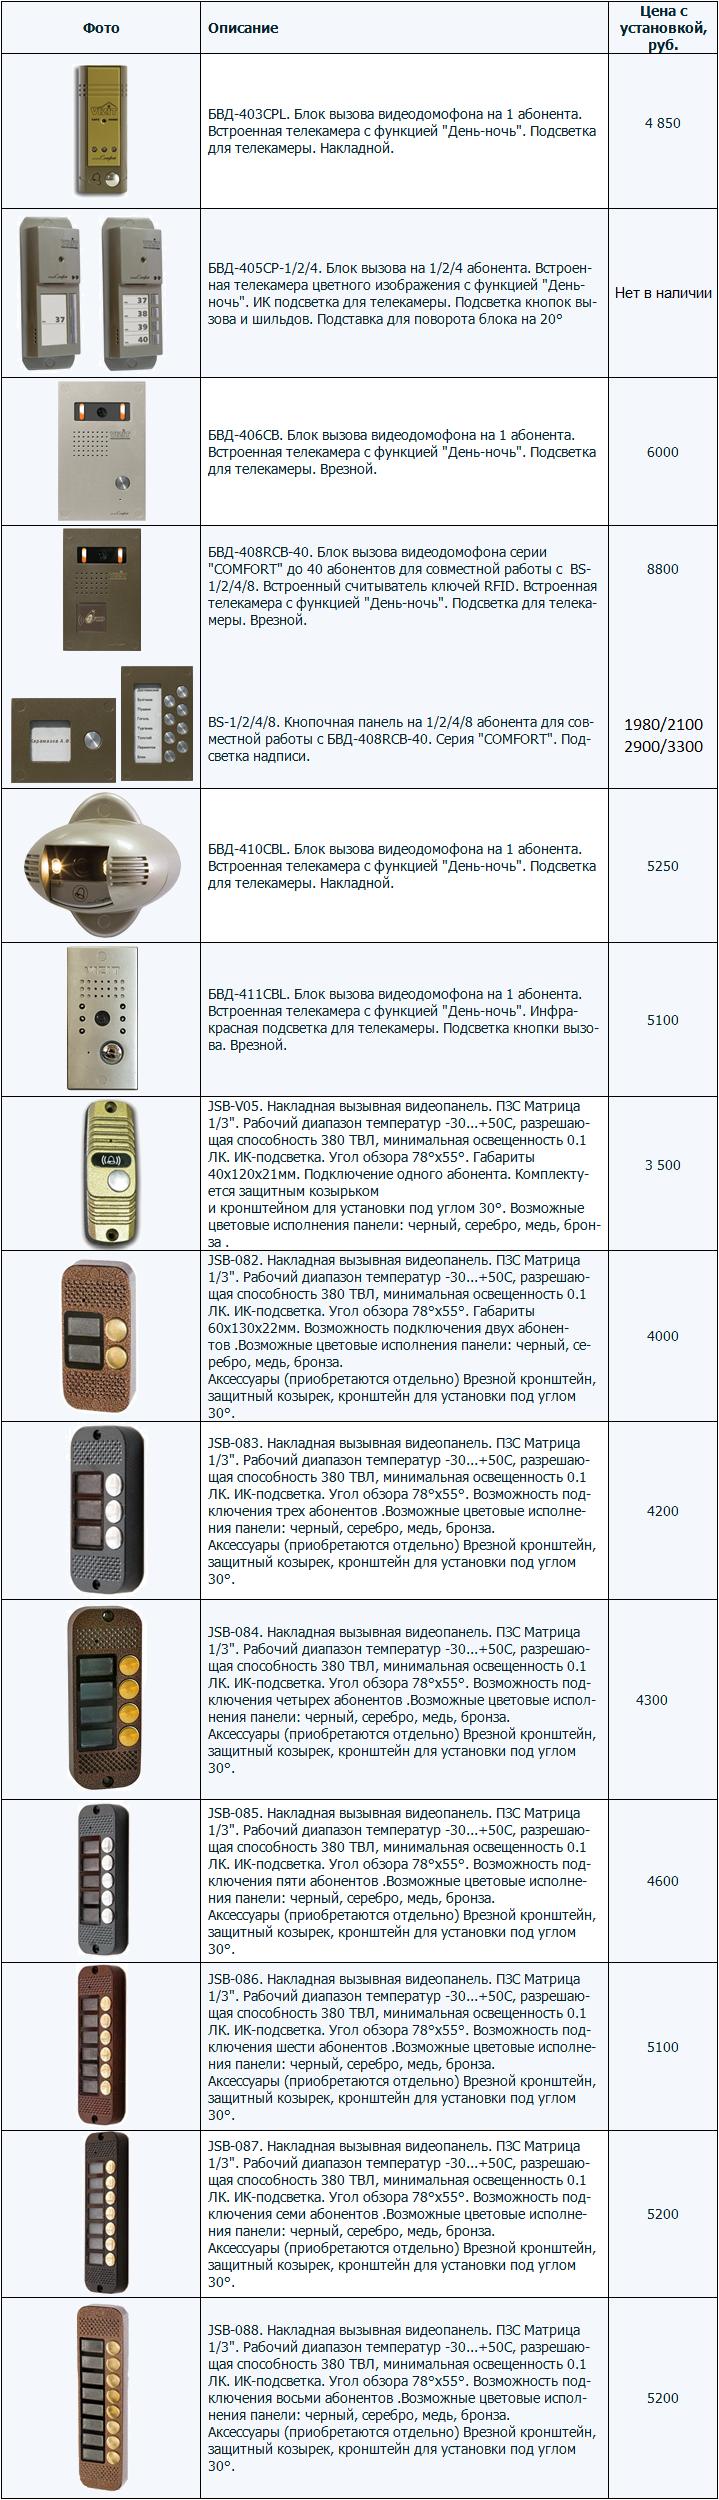 Модели домофонов: БВД-403CPL, 405CP-1/2/4, БВД-406CB, 408RCB-40, BS-1/2/4/8, 410-411CBL, JSB-V05, 082, 083, 084, 085, 086, 087, JSB-088